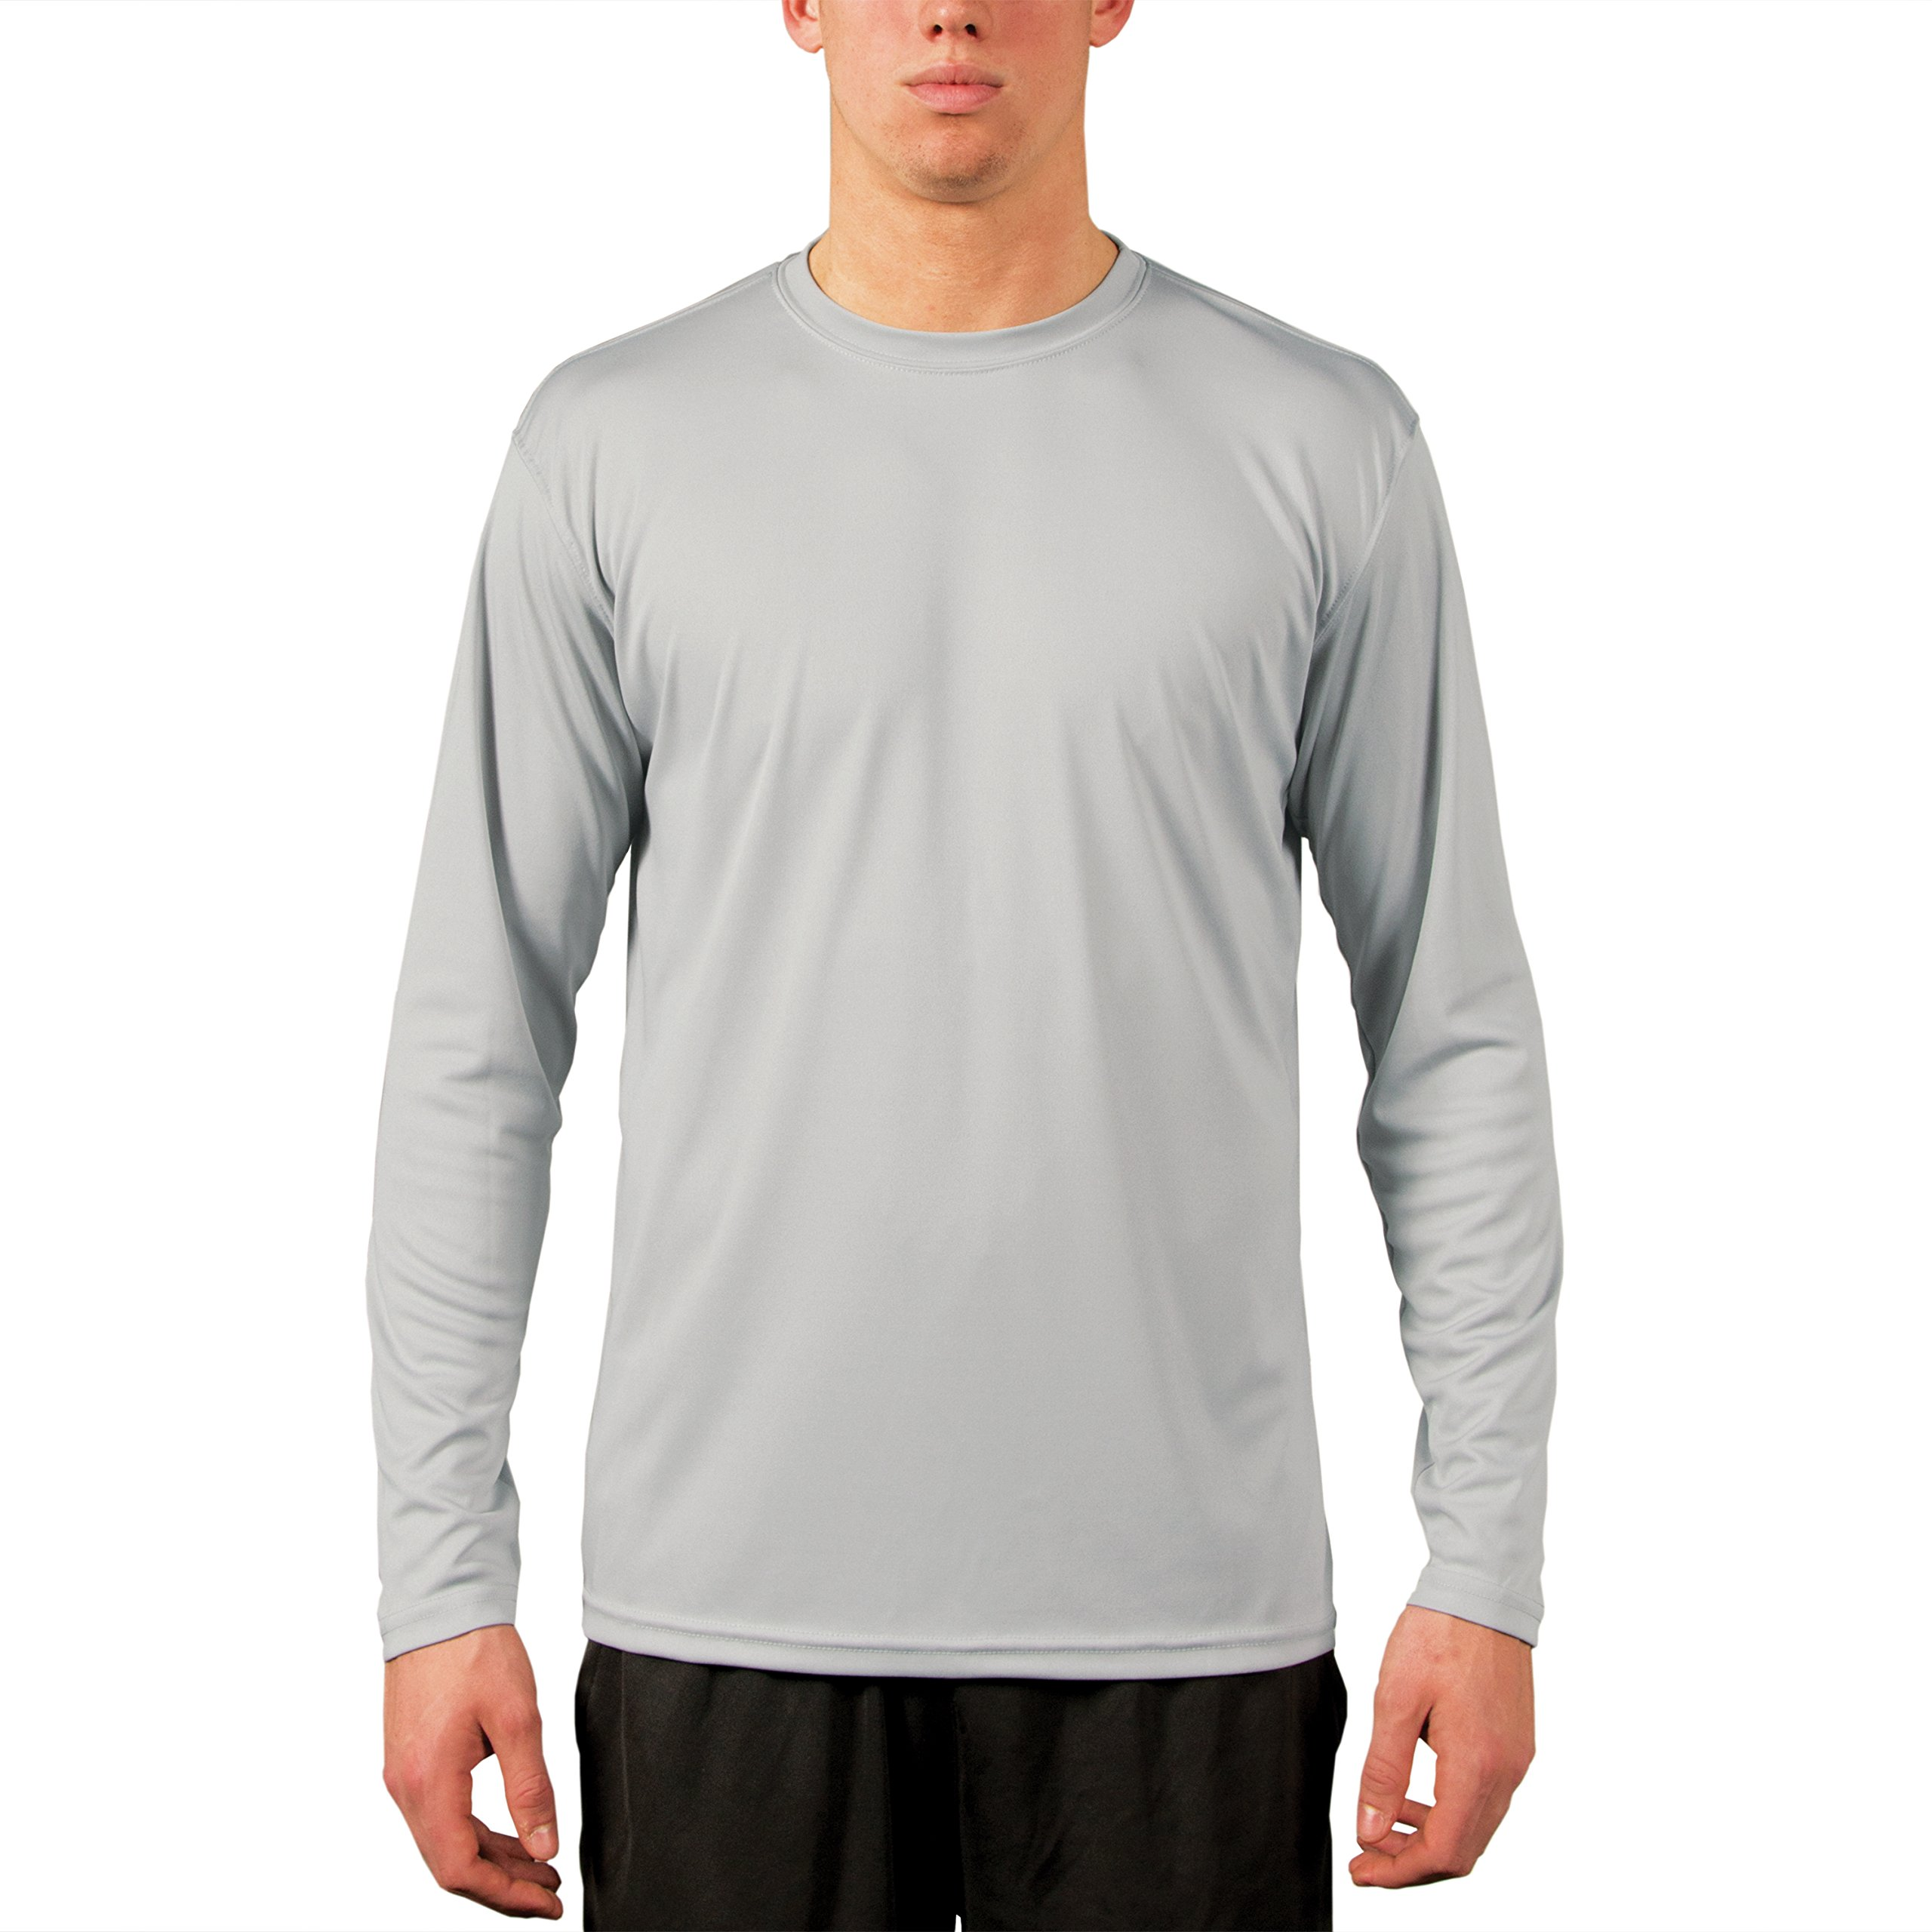 Vapor Apparel Men's UPF 50+ UV Sun Protection Performance Long Sleeve T-Shirt X-Large Pearl Grey by Vapor Apparel (Image #1)